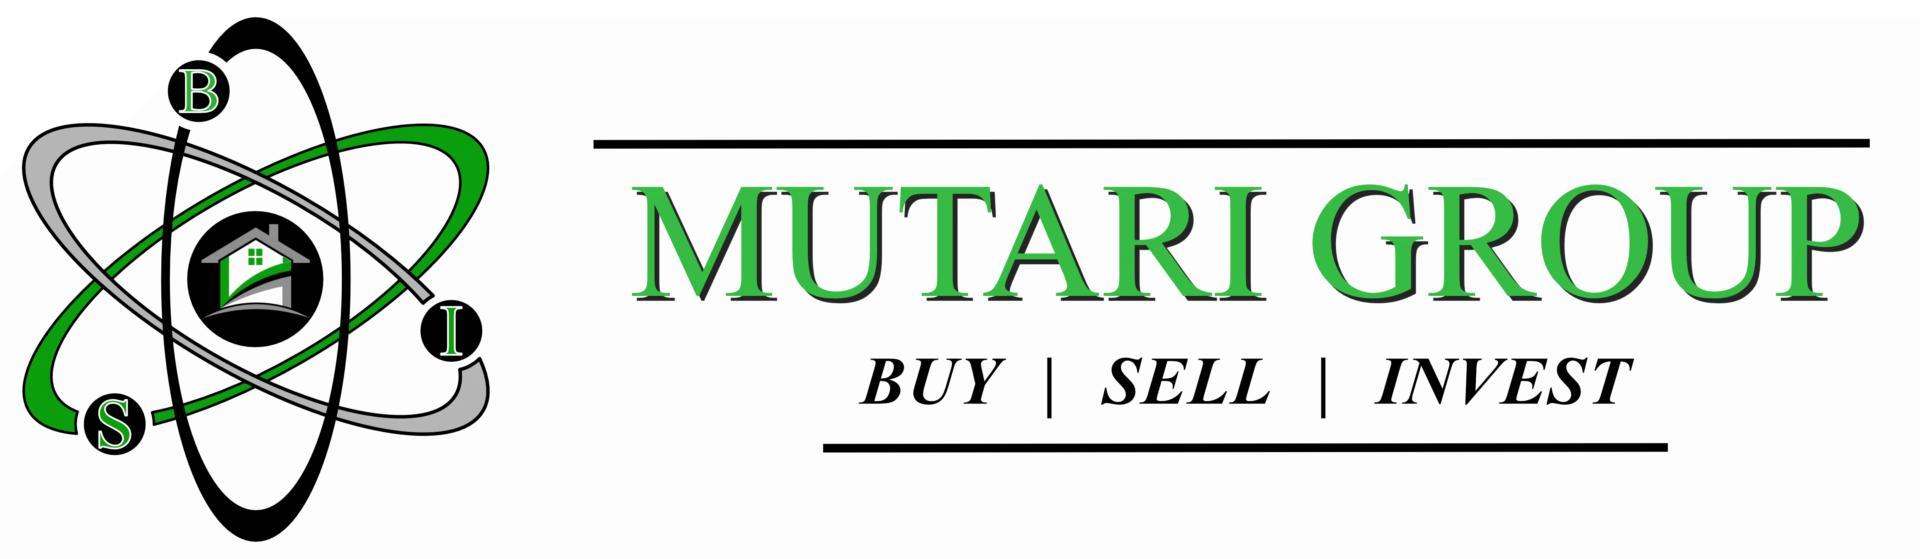 Mutari Group logo